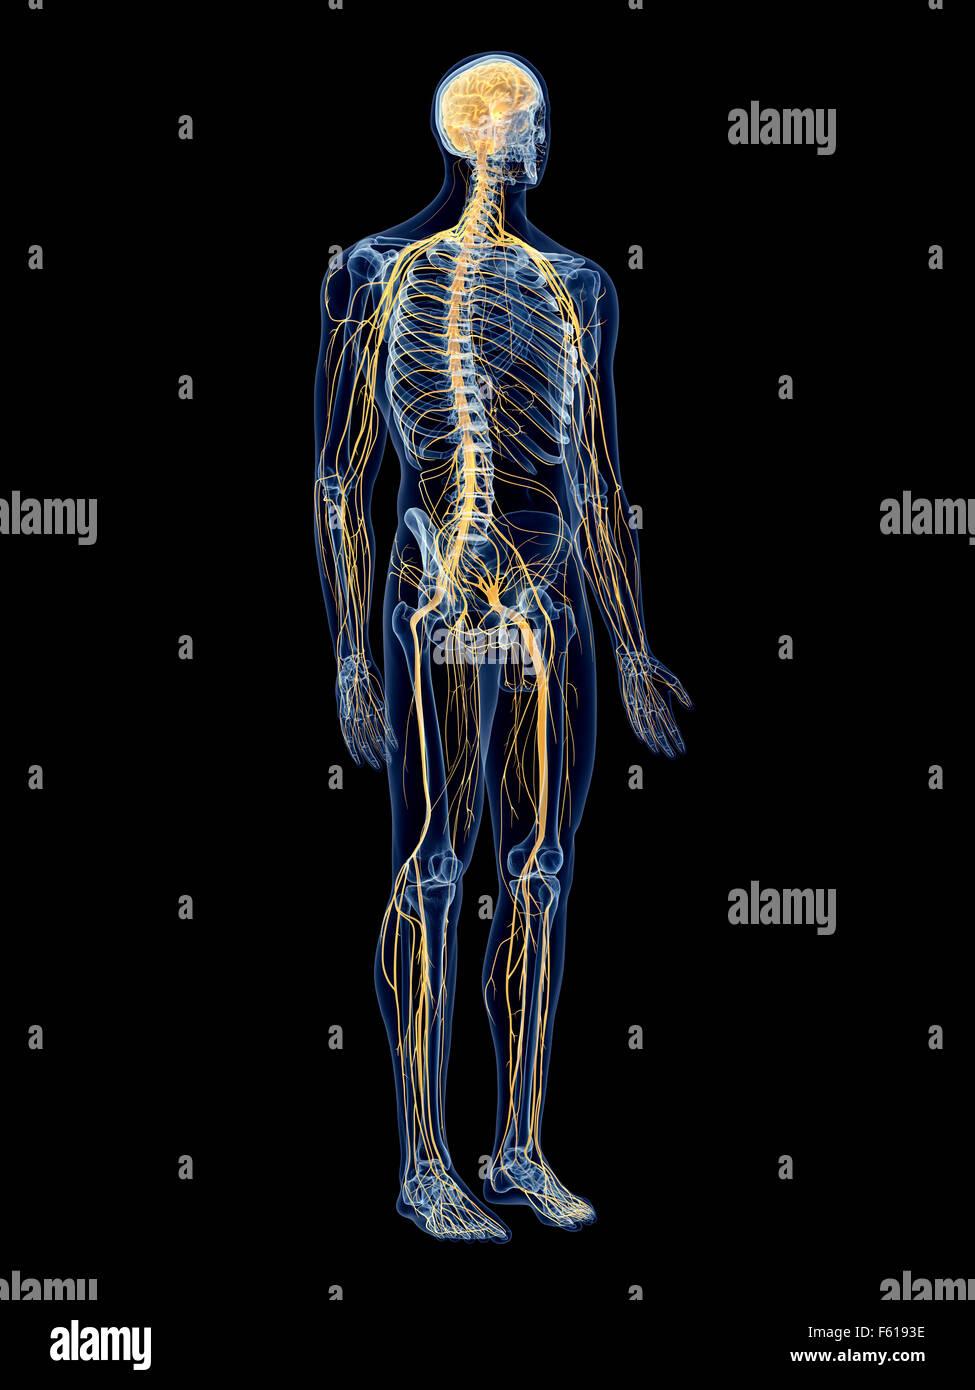 medizinisch genaue Abbildung des Nervensystems Stockfoto